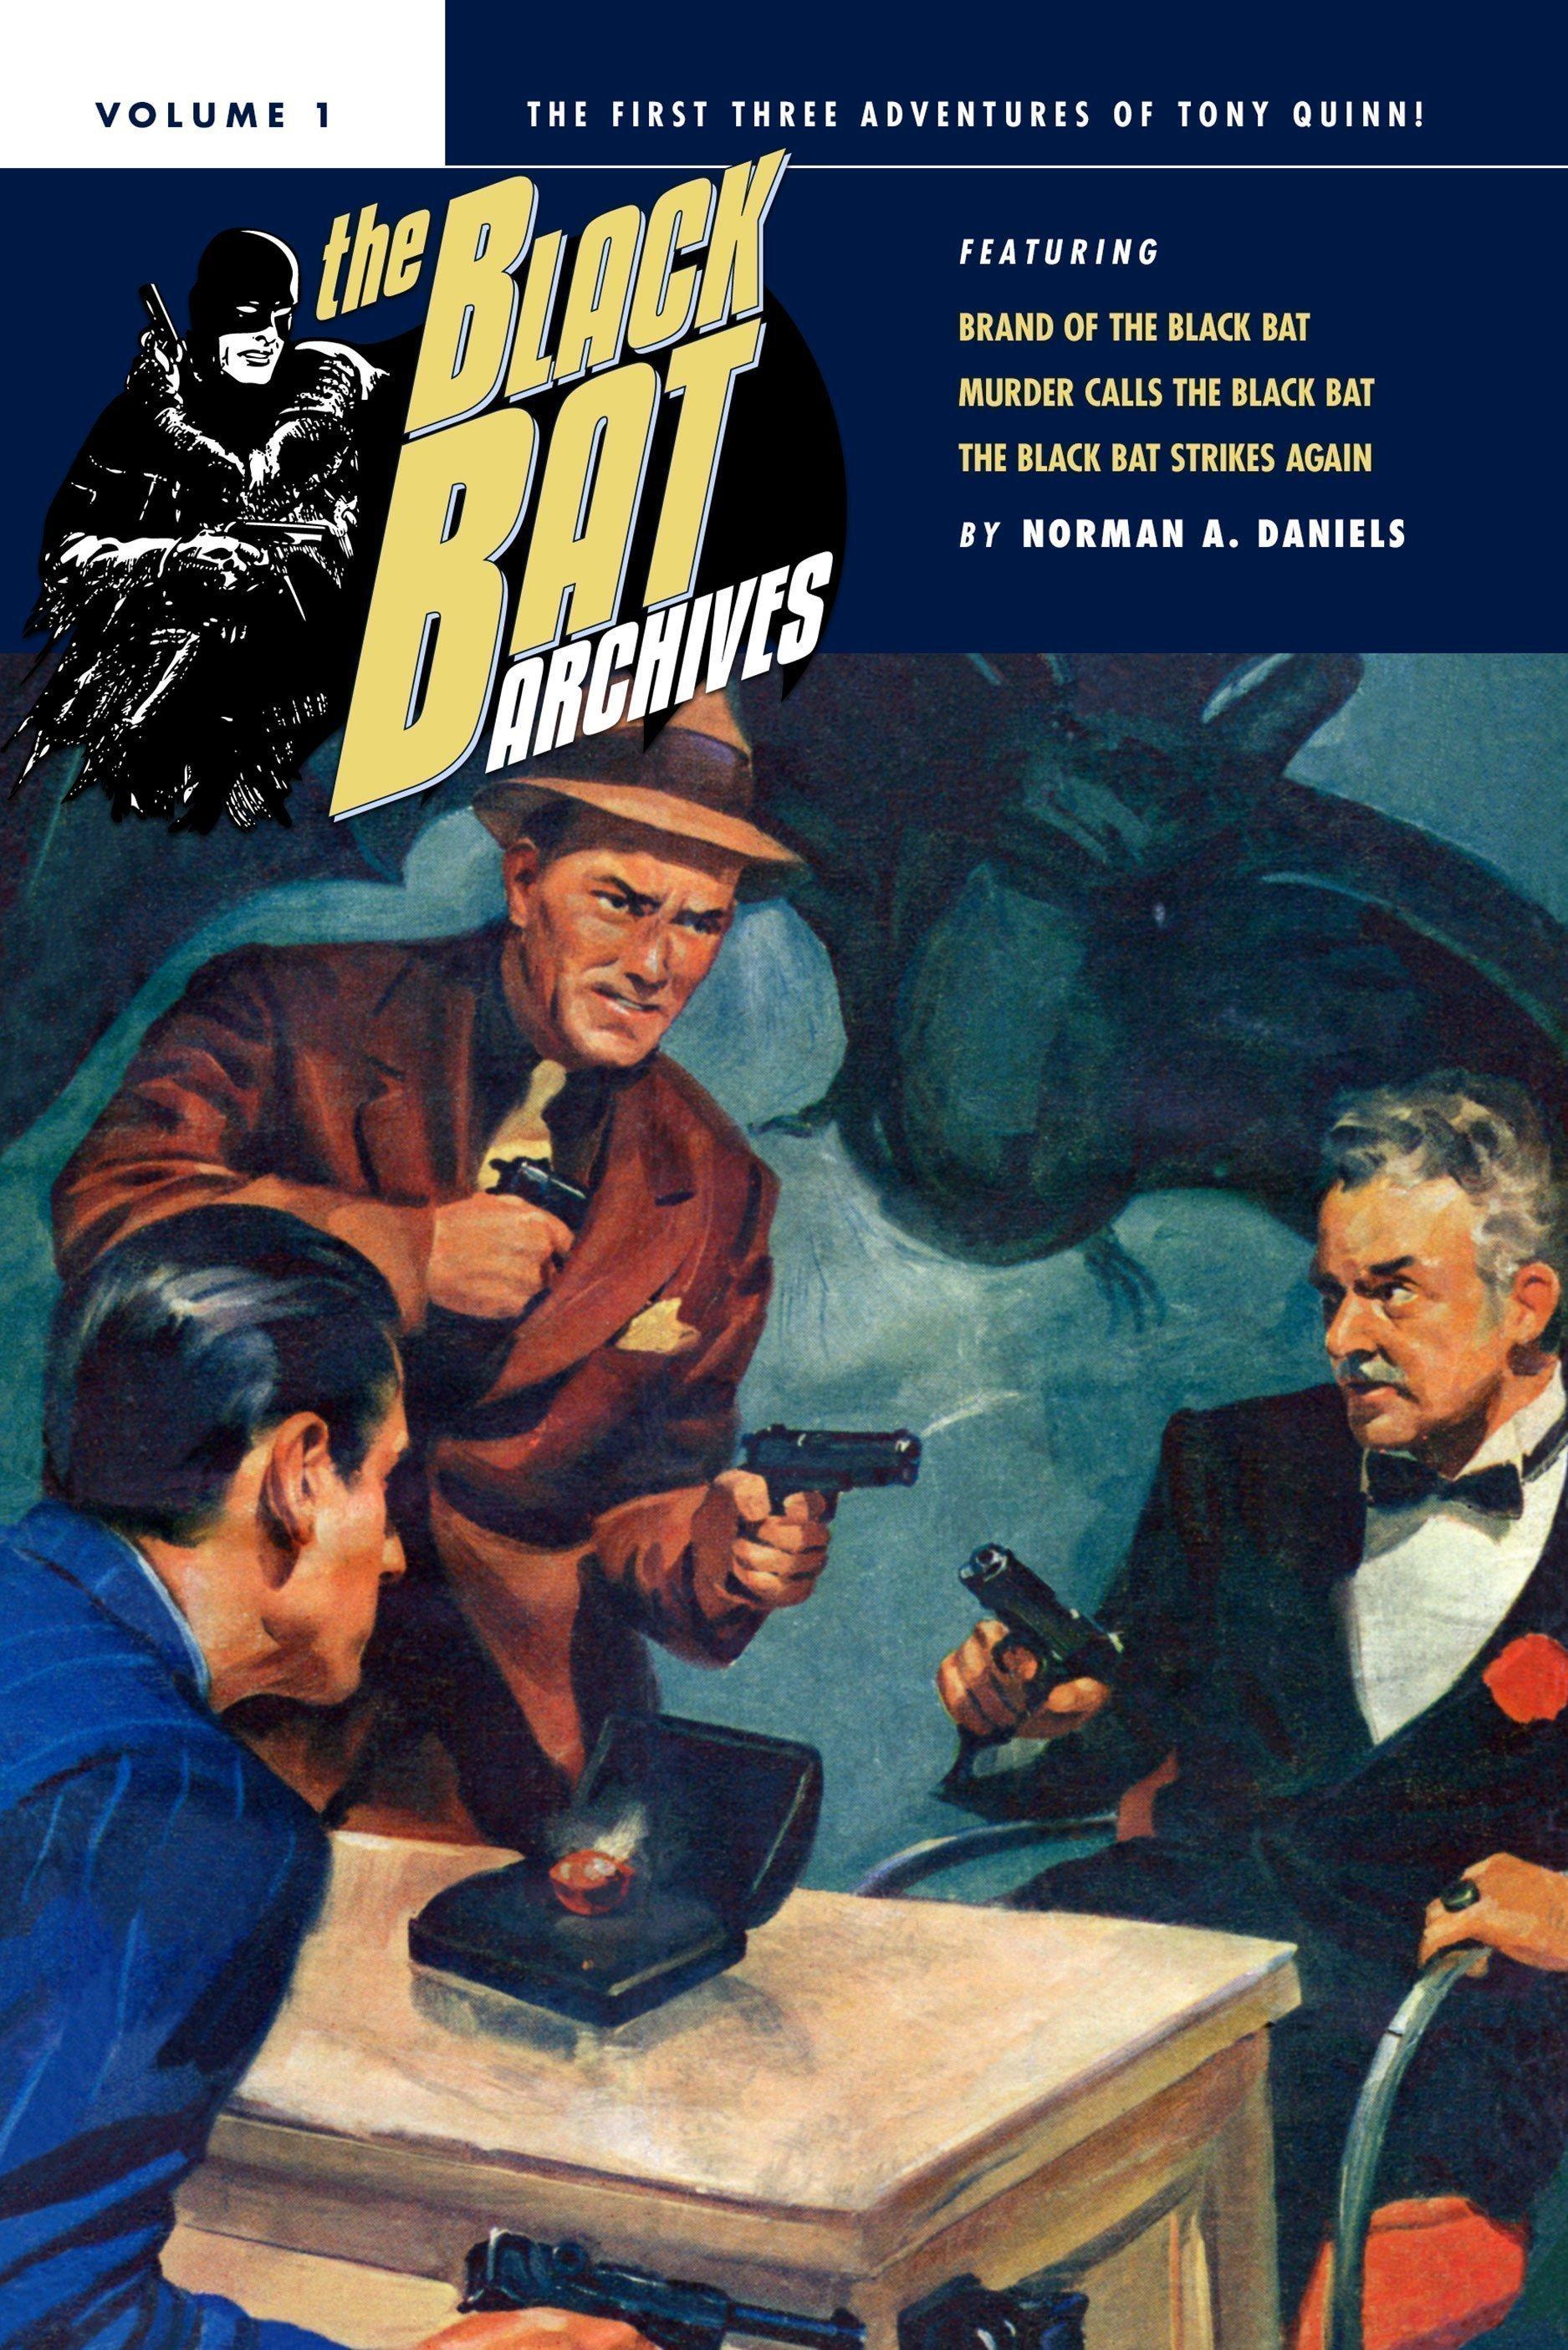 The Black Bat Archives, Volume 1